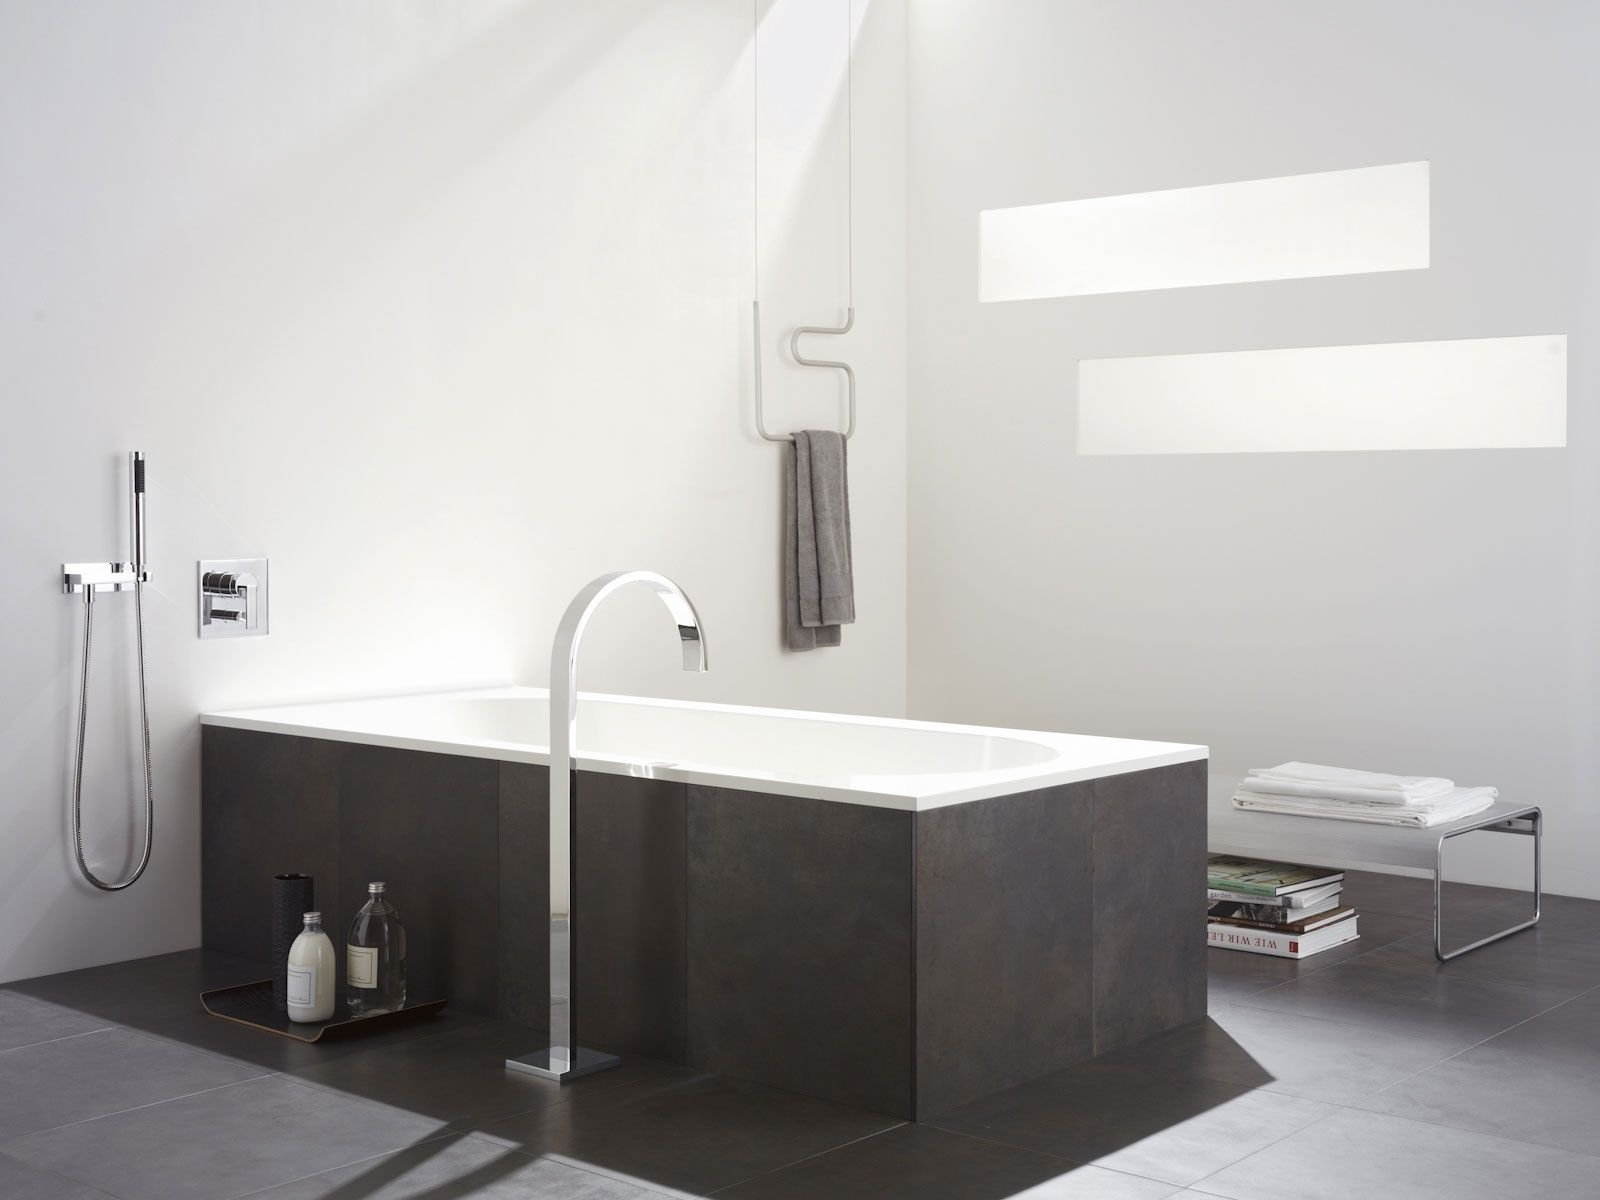 Badezimmer Armaturen ~ Mem bad & spa armatur dornbracht bath pinterest